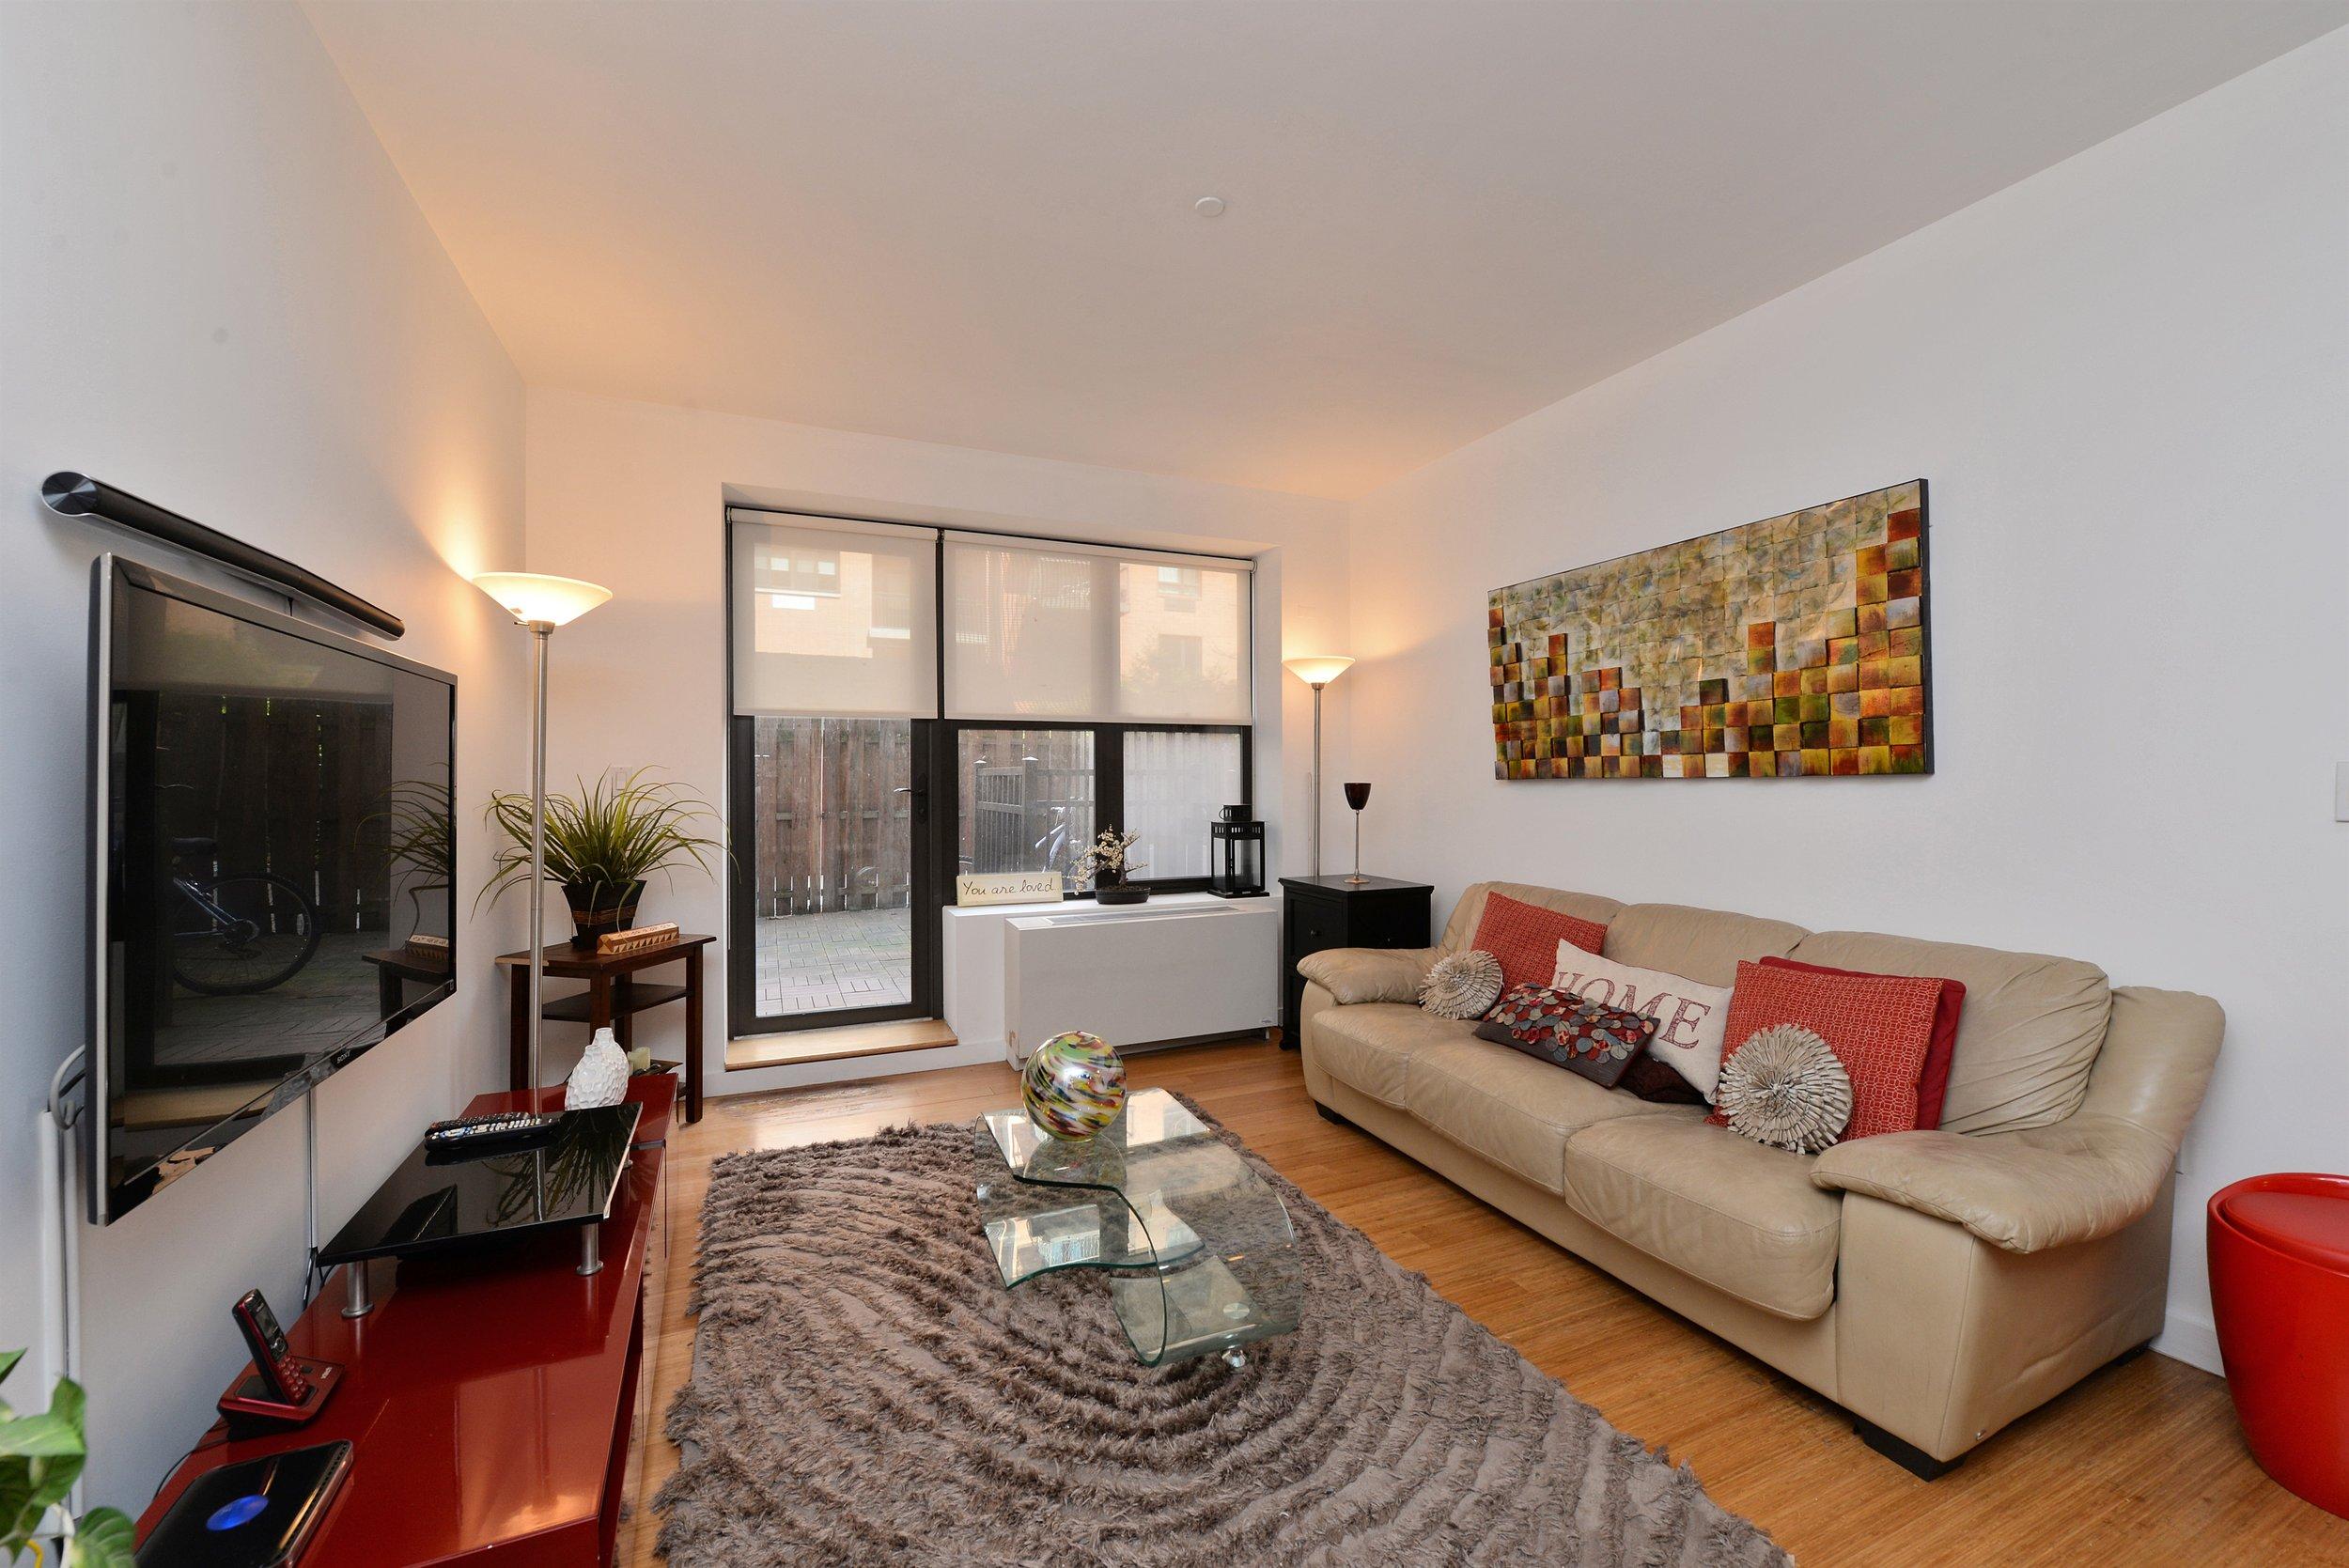 317 E 111 - Living Room - view to the patio.jpg